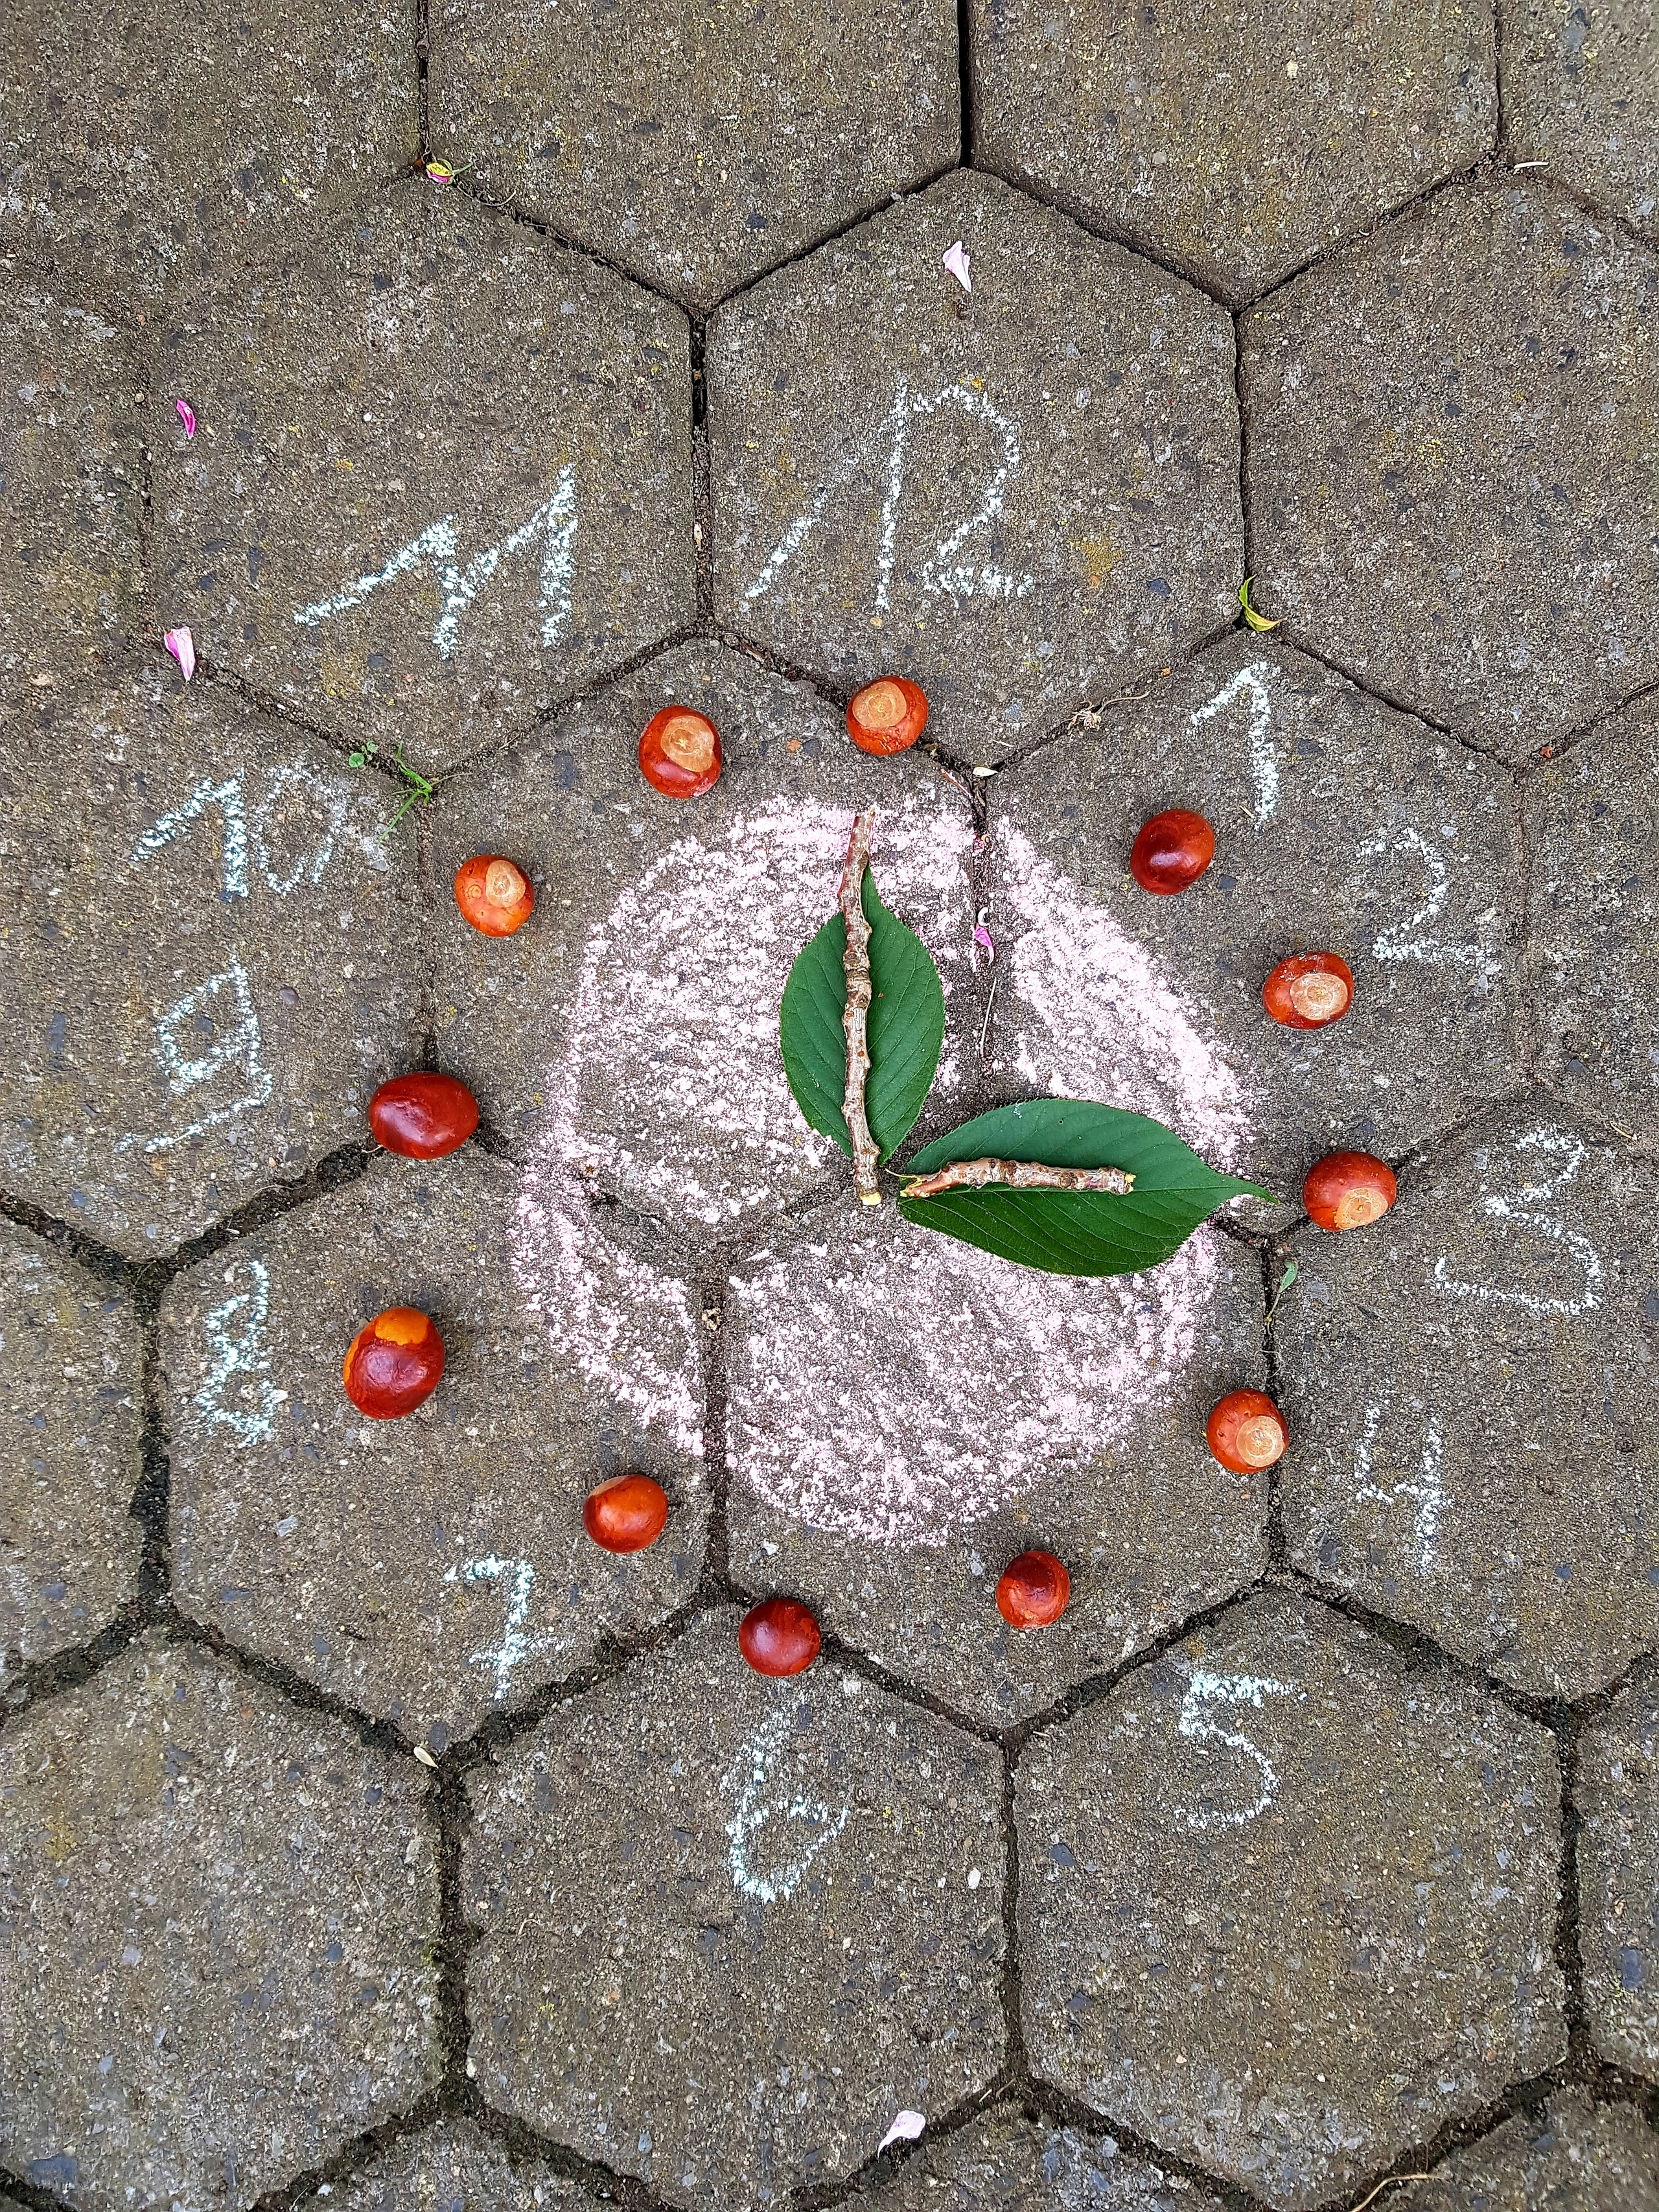 DIY Chestnut Activities for Kids - Fall STEM Activity